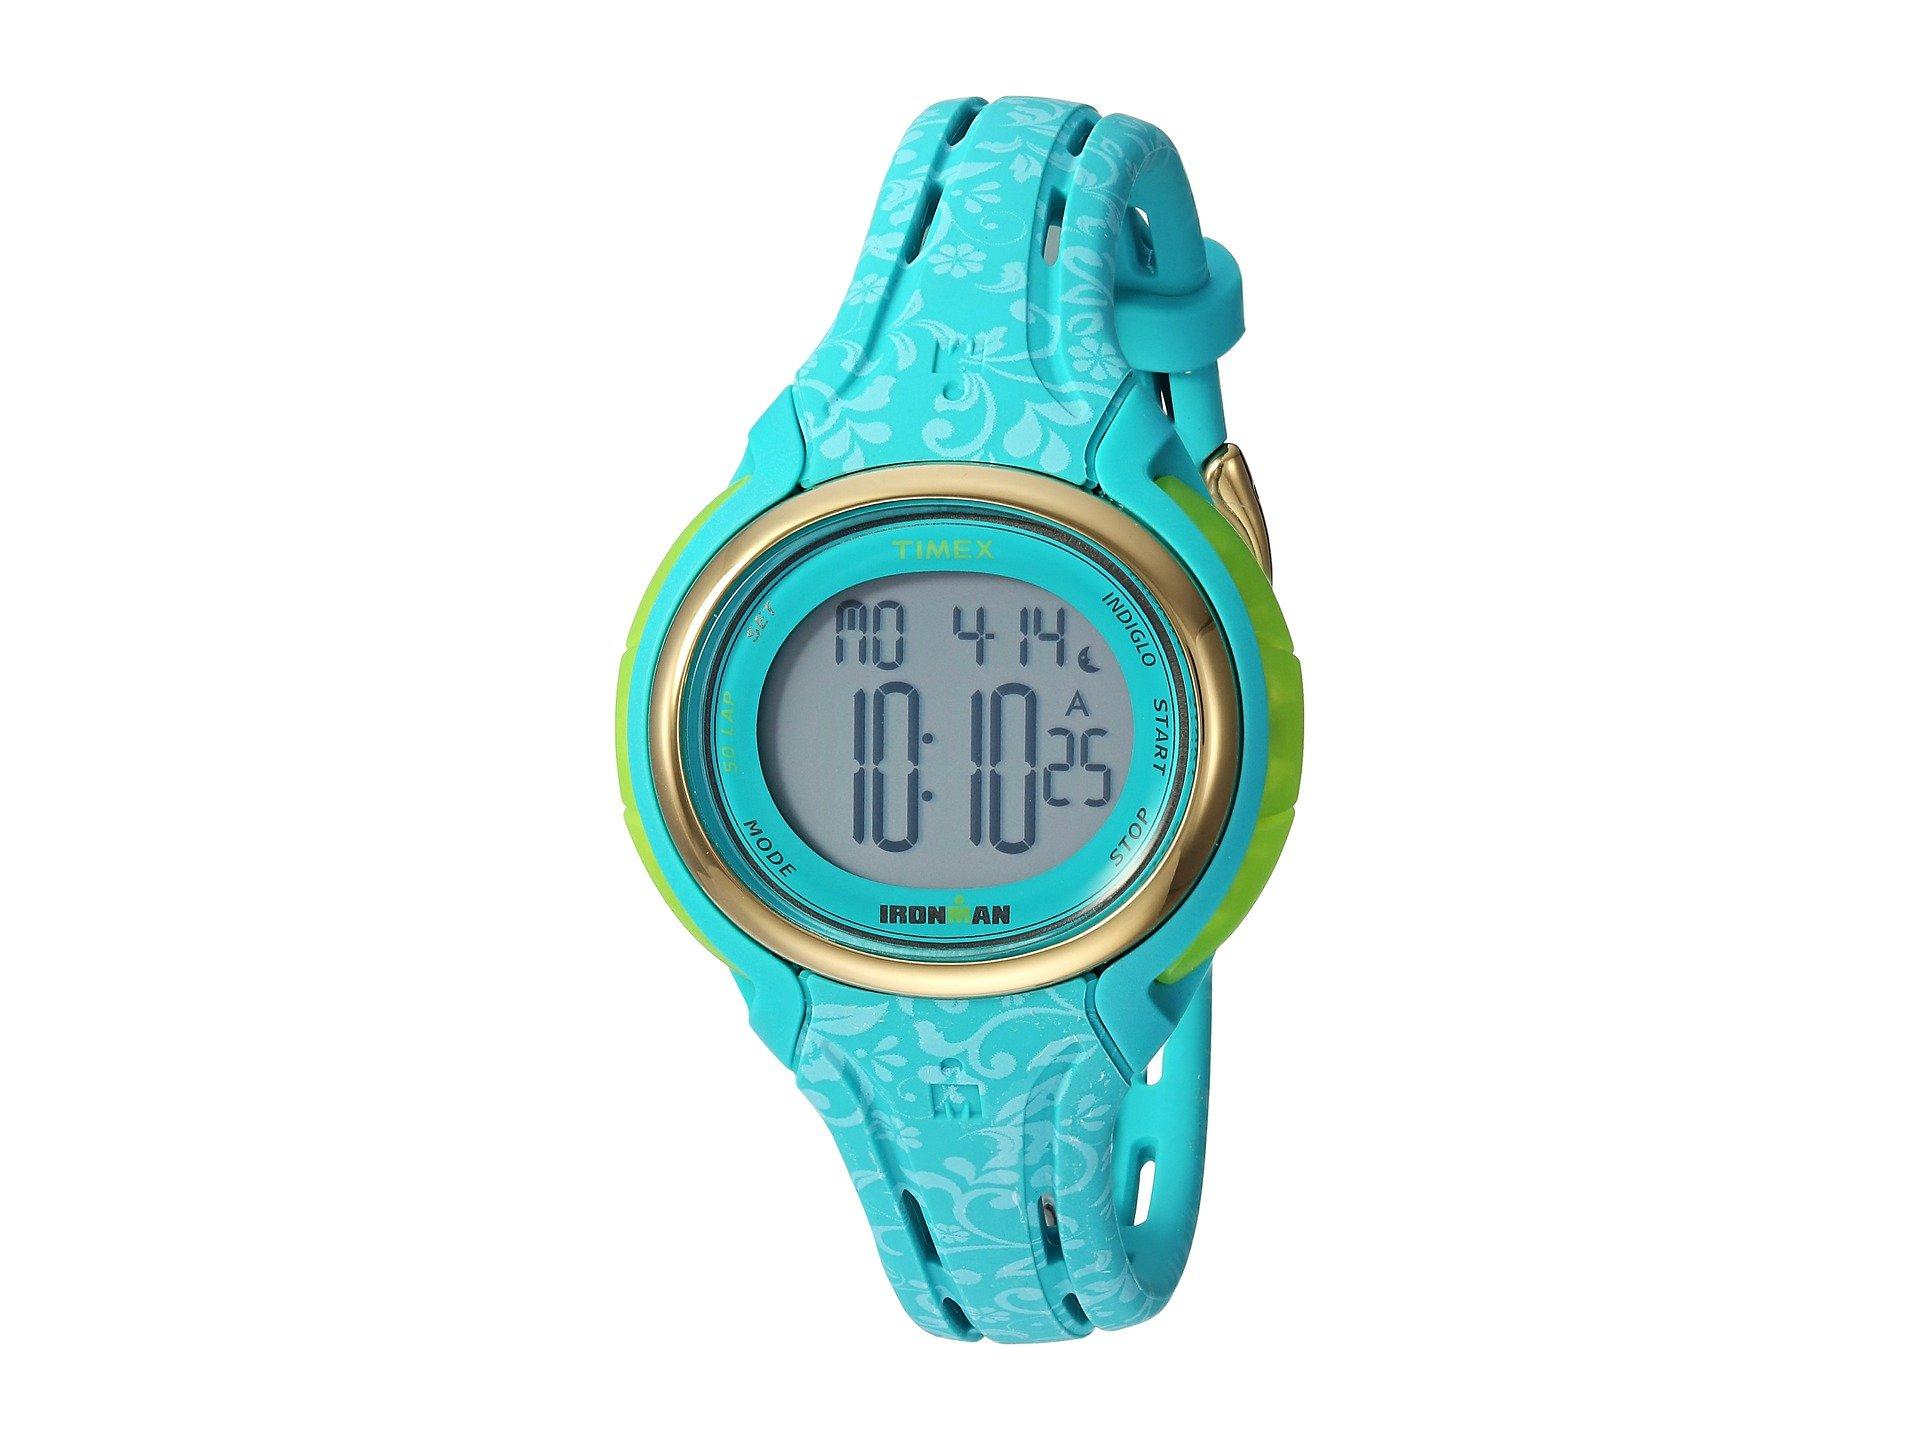 Reloj para Hombre Timex Ironman® Sleek 50 Mid-Size  + Timex en VeoyCompro.net